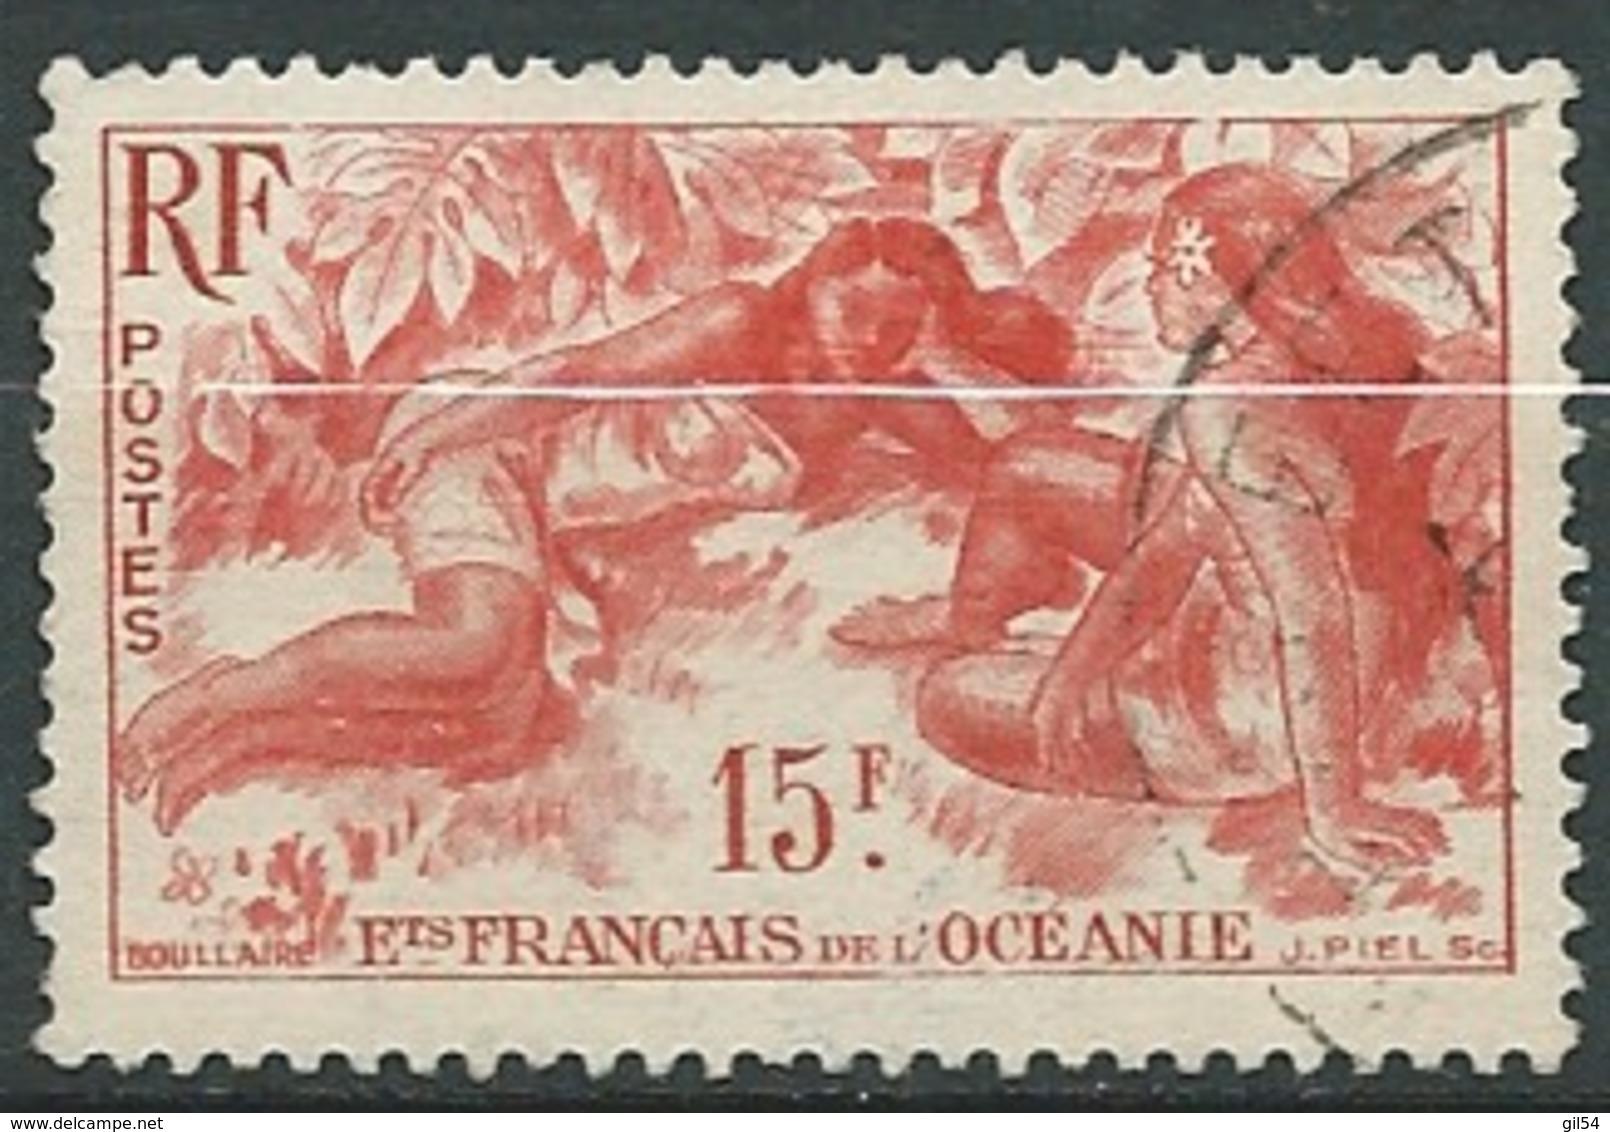 Oc Eanie - Yvert N° 198 Oblitéré     - Ai 27418 - Océanie (Établissement De L') (1892-1958)